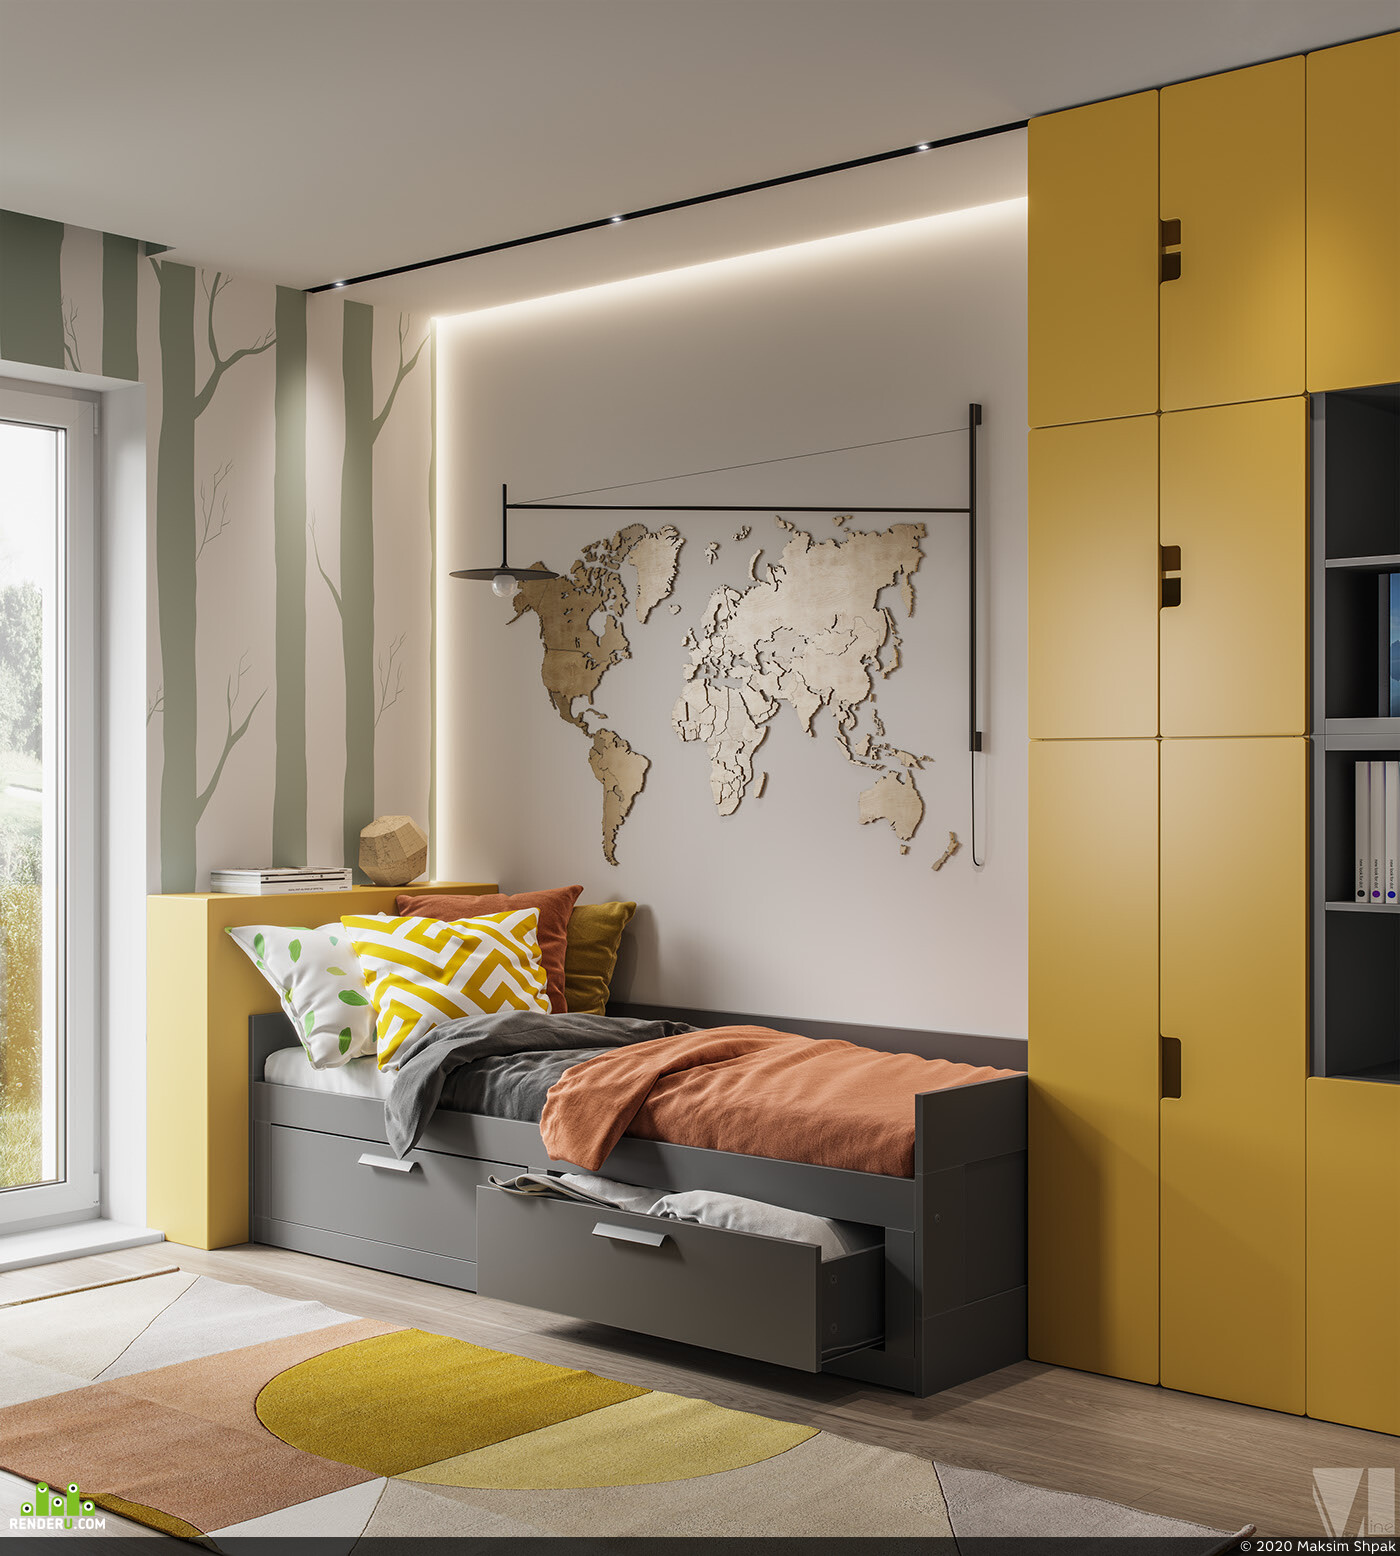 vizlinestudio, interior, interior design, interior interior design design 3D 3D Studio Max 3D архитектура интерьер дизайн интерьера интерьер, visualization